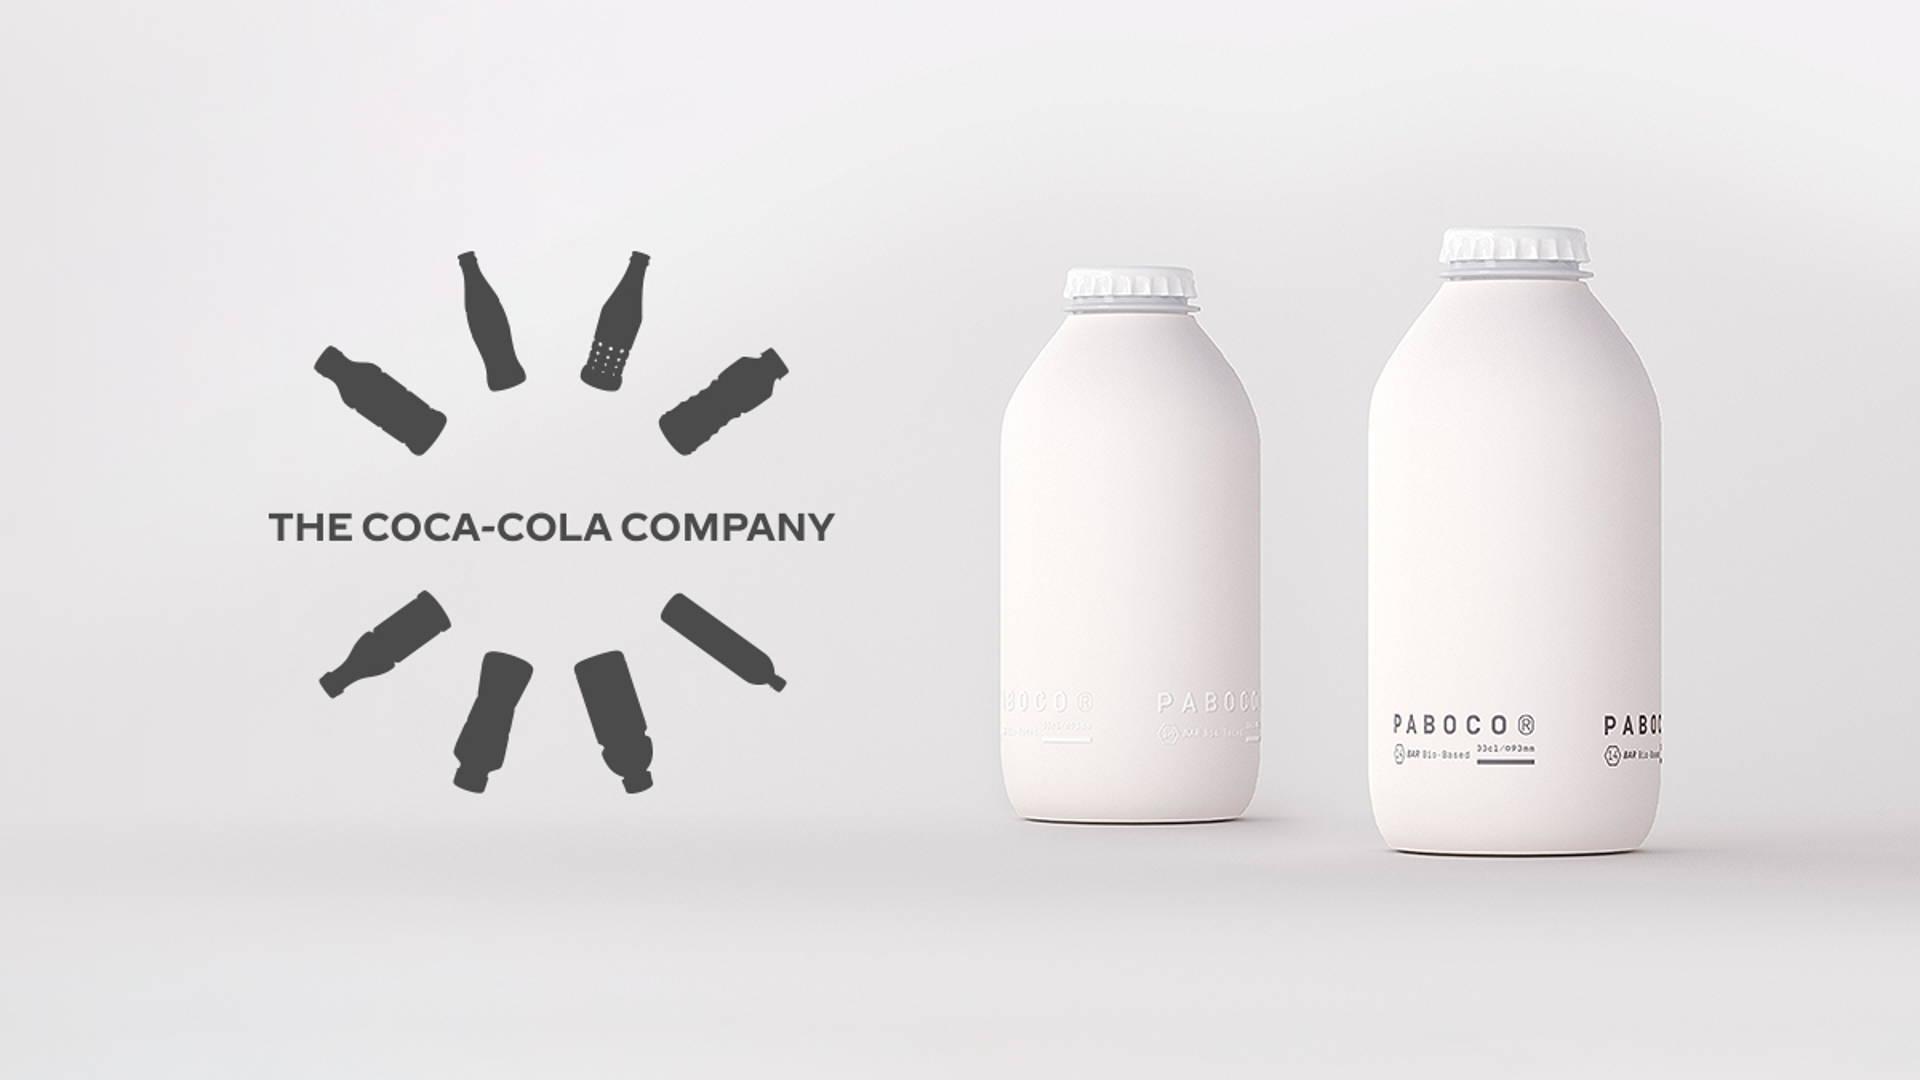 Coca-Cola İlk Kağıt Şişe Prototipini Tanıttı